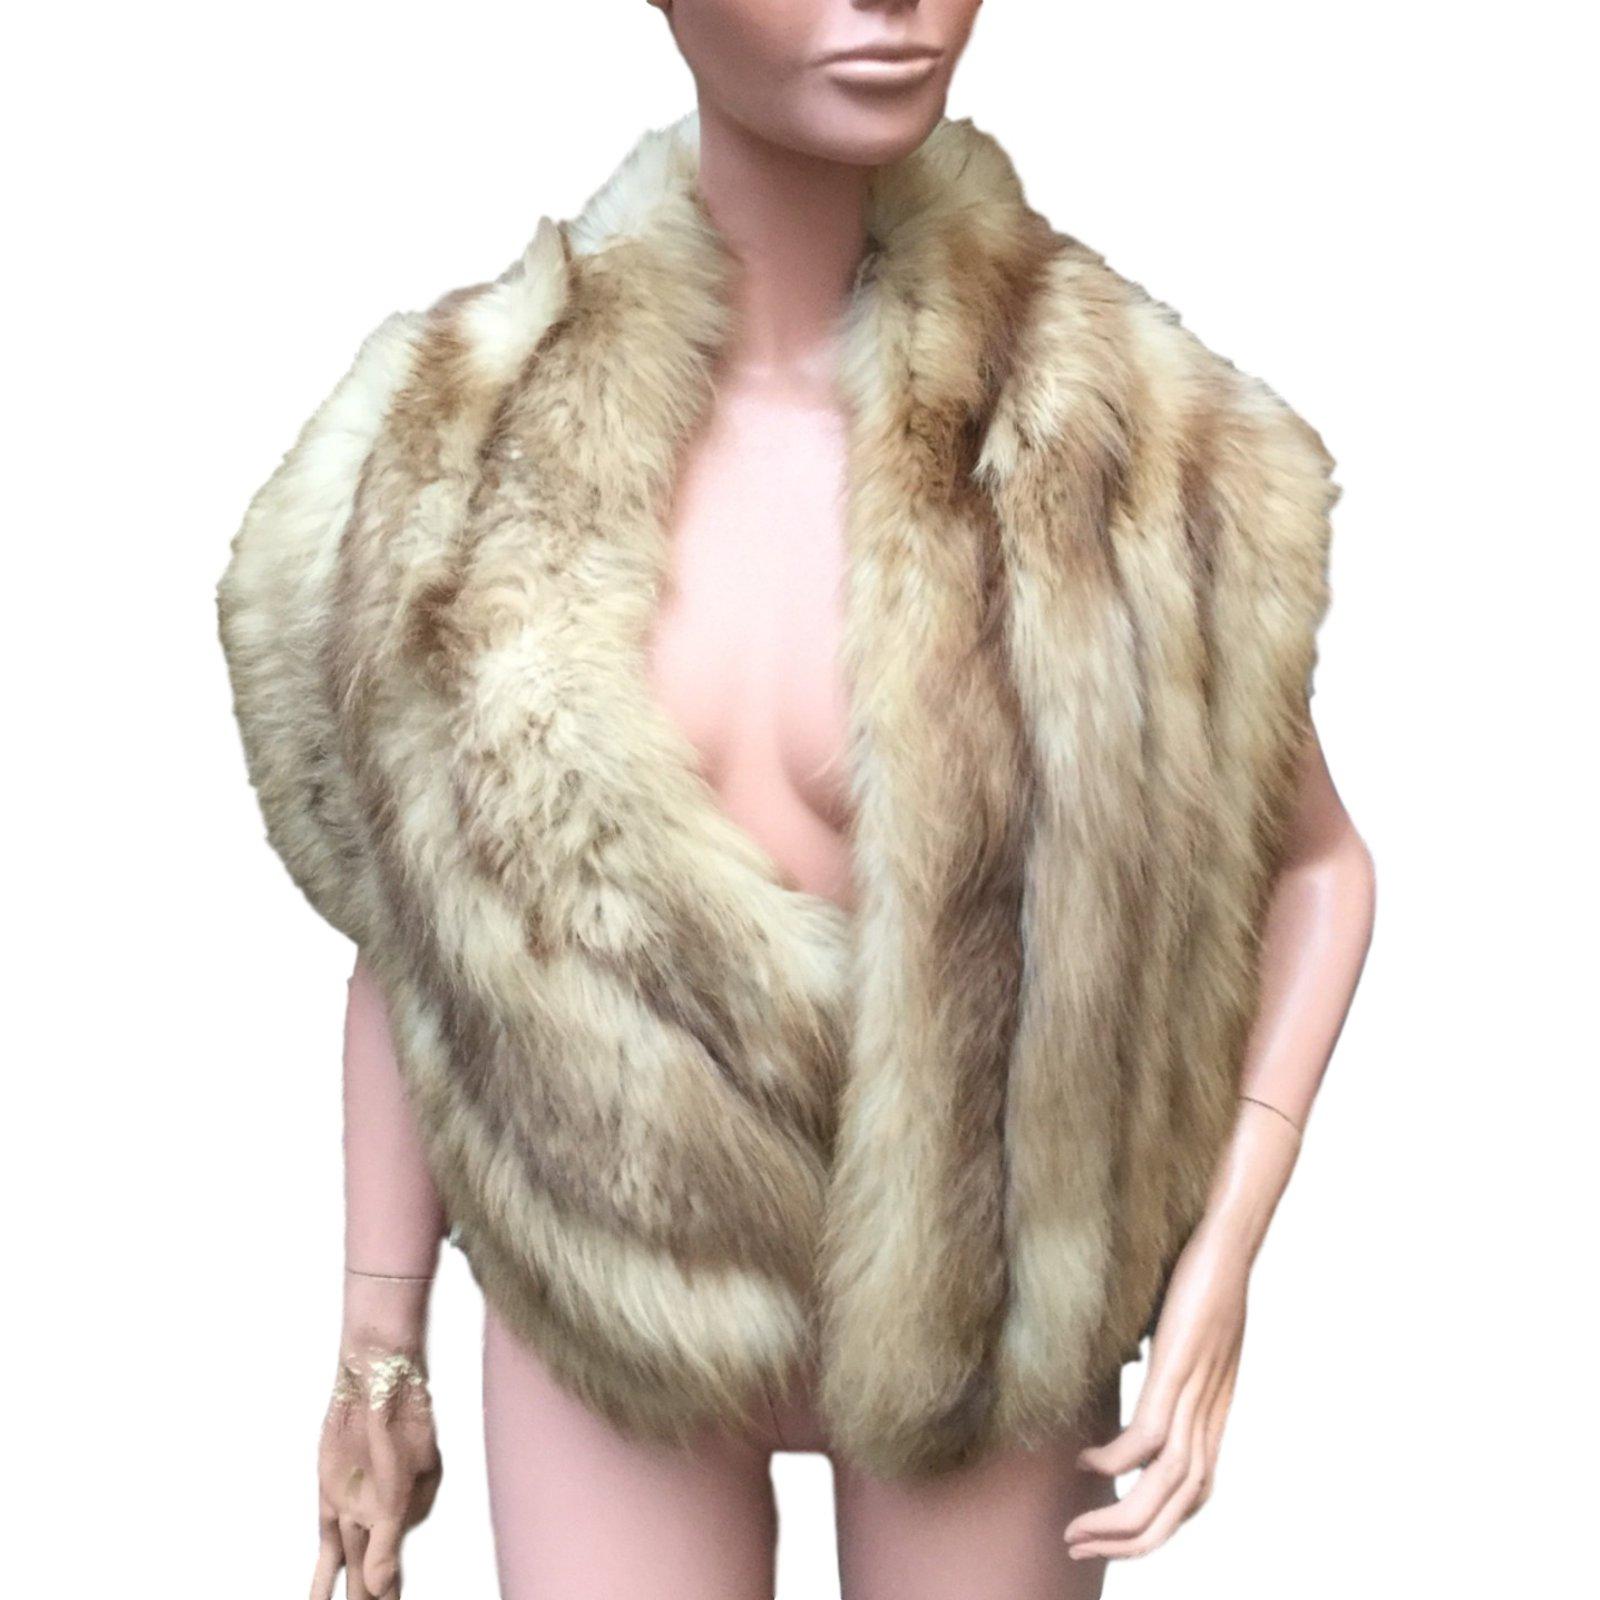 f84158e8eb63 Manteaux Vintage Etole fourrure Fourrure Marron ref.12454 - Joli Closet